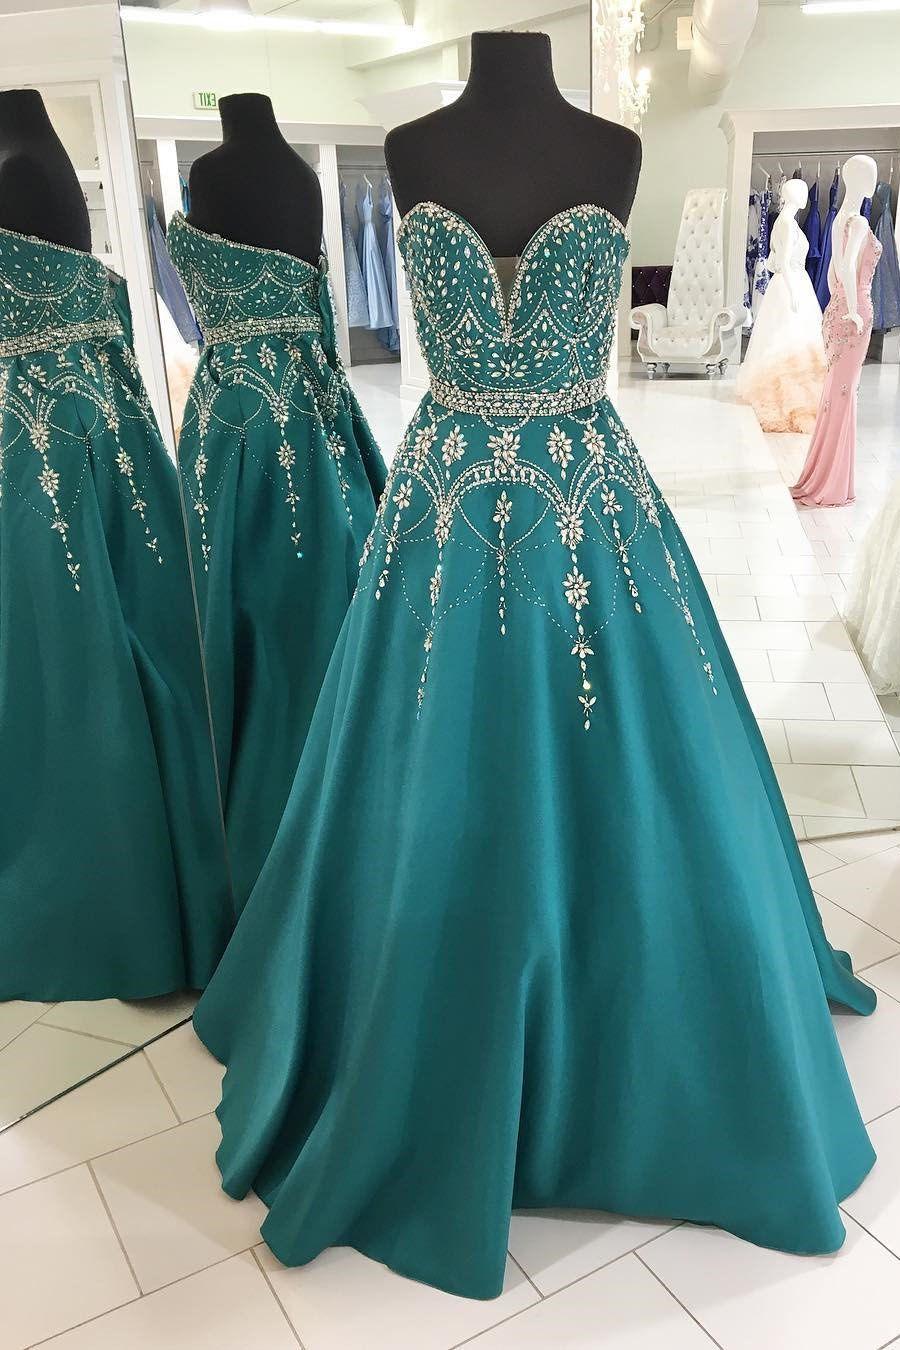 Charming Prom Dress Pinterest Contemporary - Wedding Ideas ...